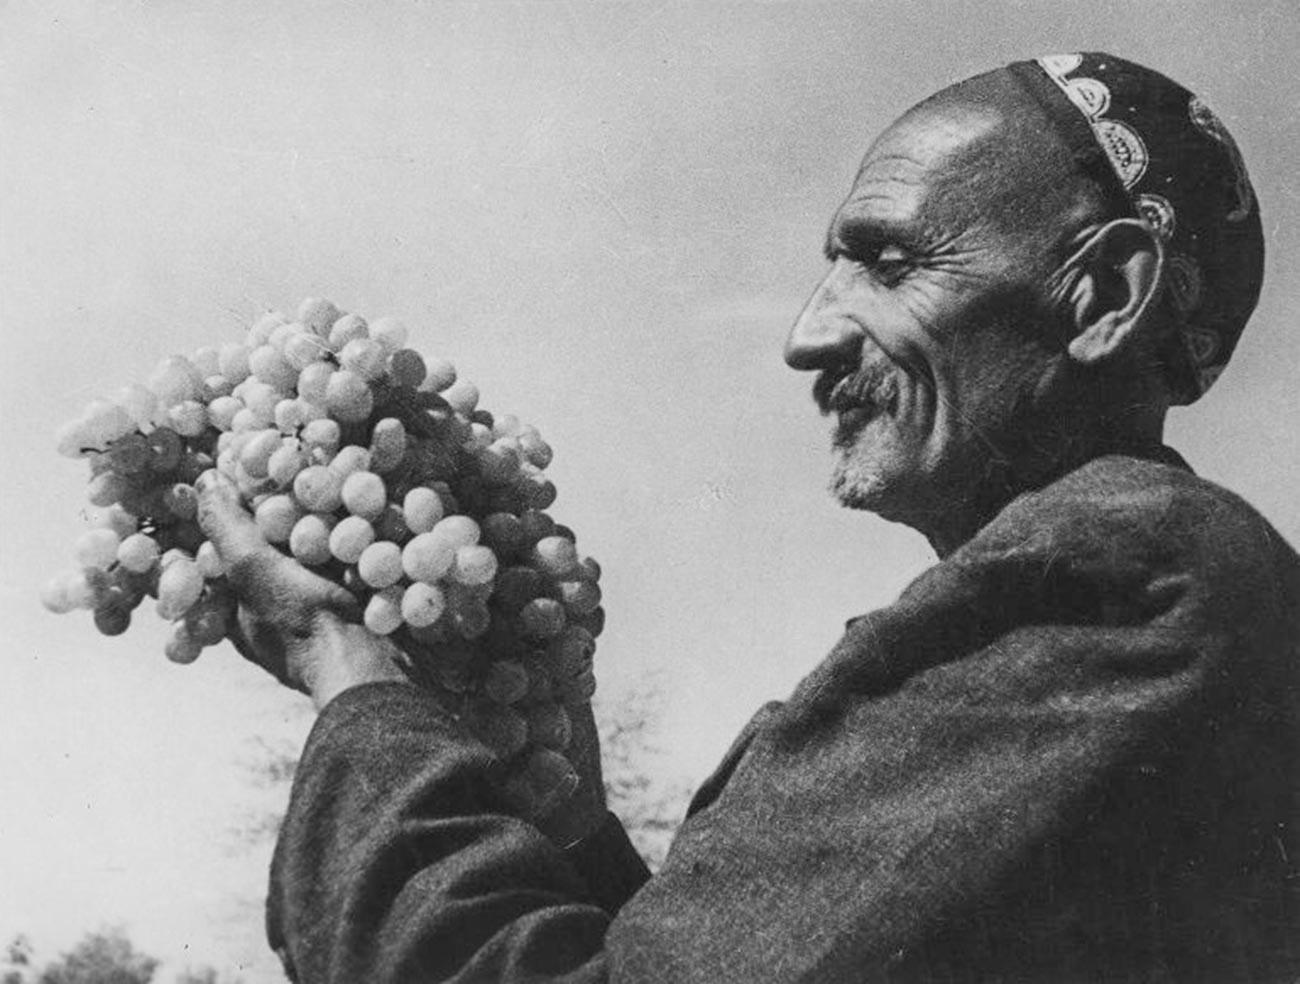 Penanam anggur terkemuka dan paling banyak dianugerahi penghargaan di Uzbekistan, Rizamat Musamukhamedov, yang membiakkan varietas anggur baru, Rundweis (alias Bayan Shirey), 1939.